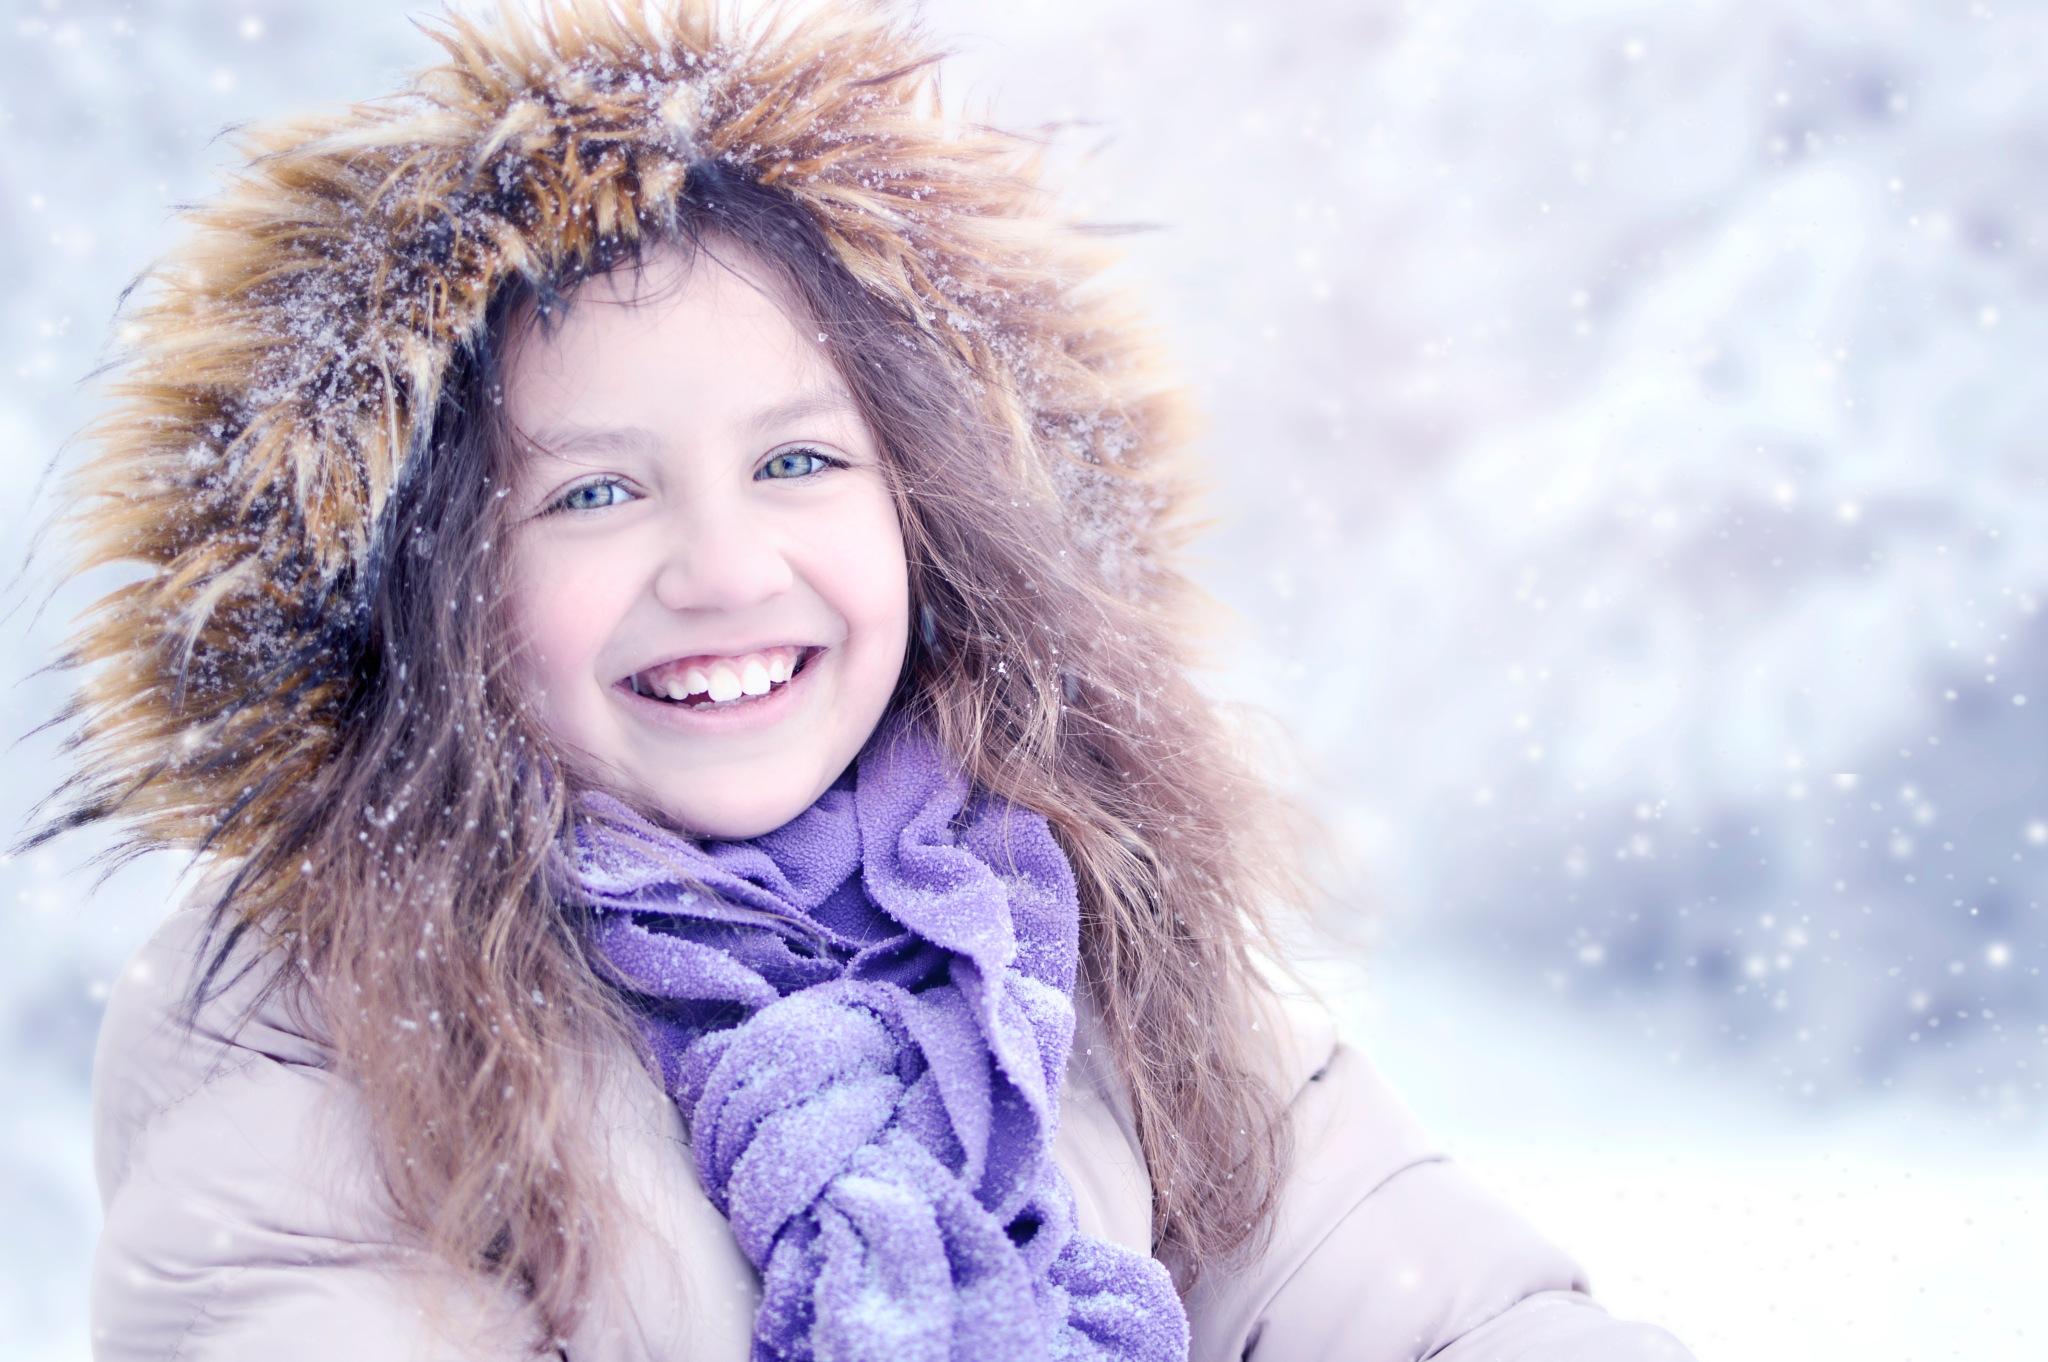 Snow girl by RumiSt